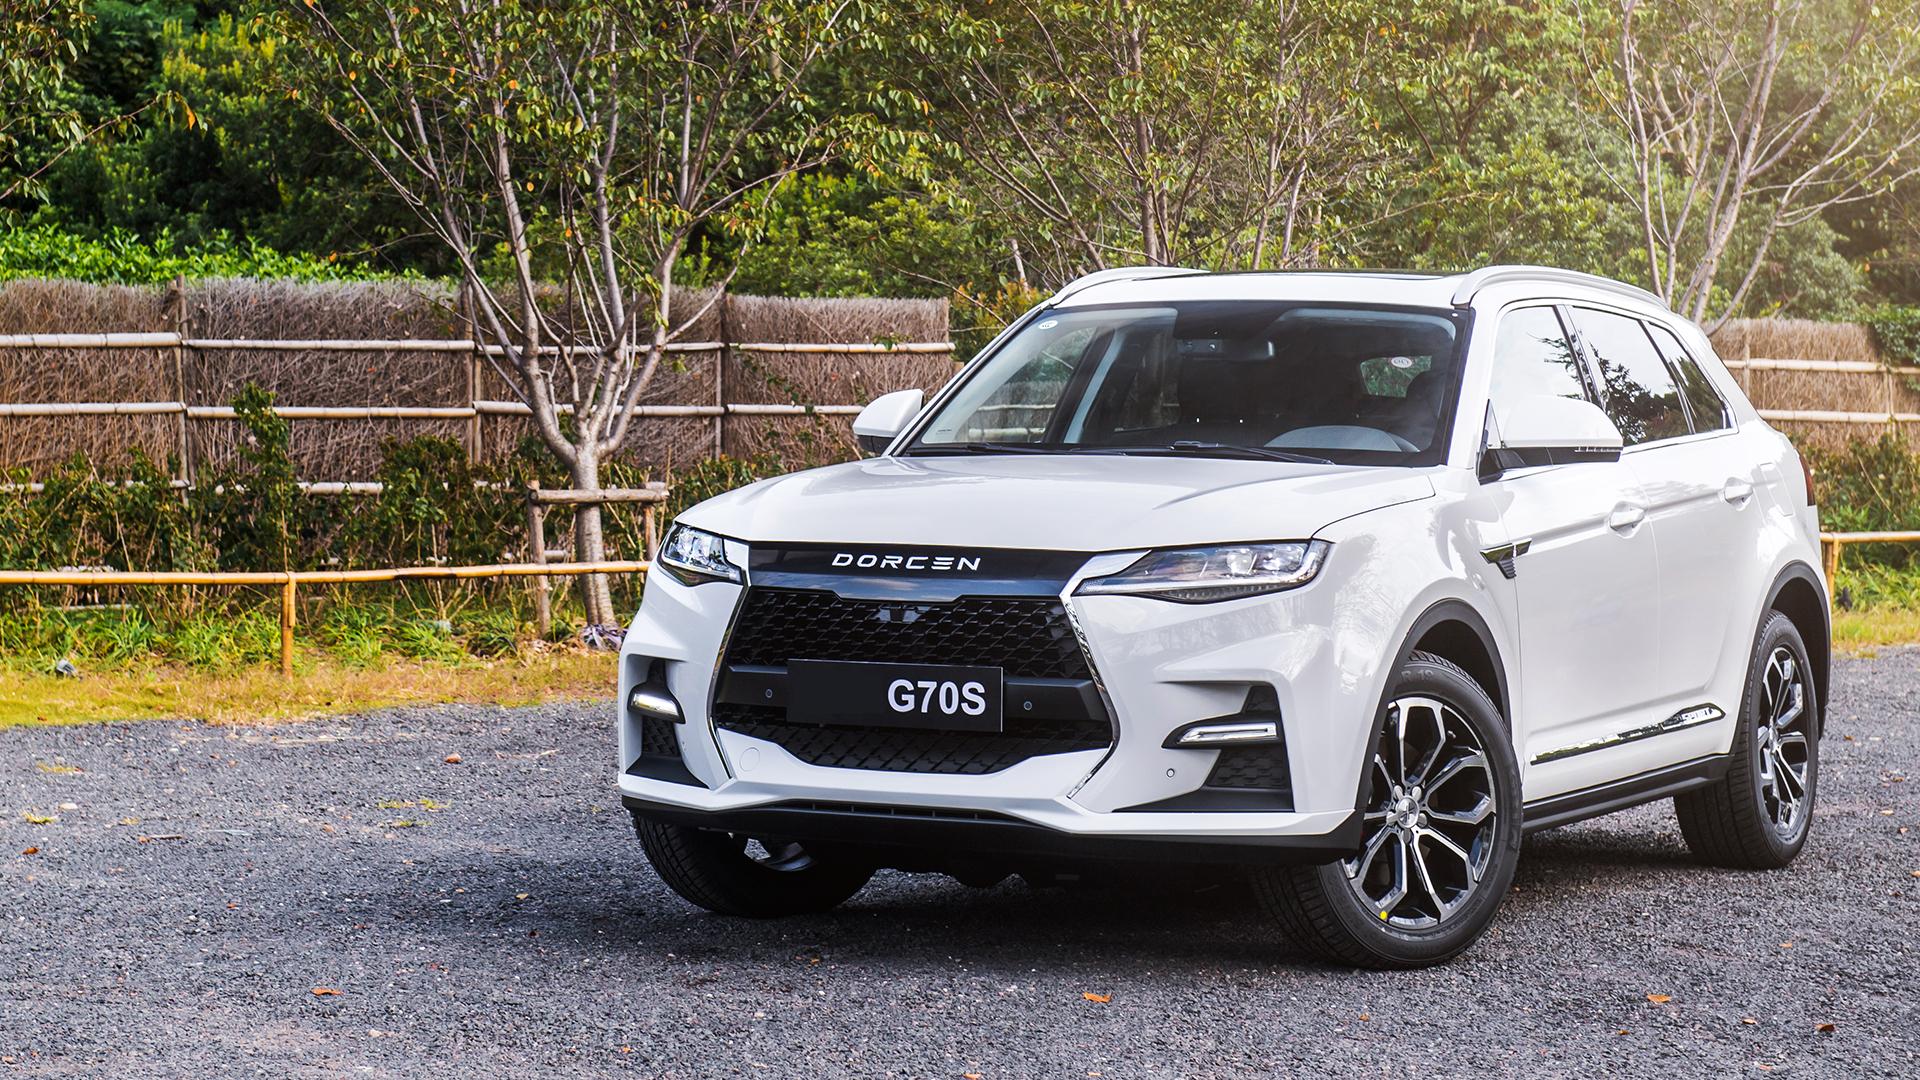 Dorcen Car Sales Data